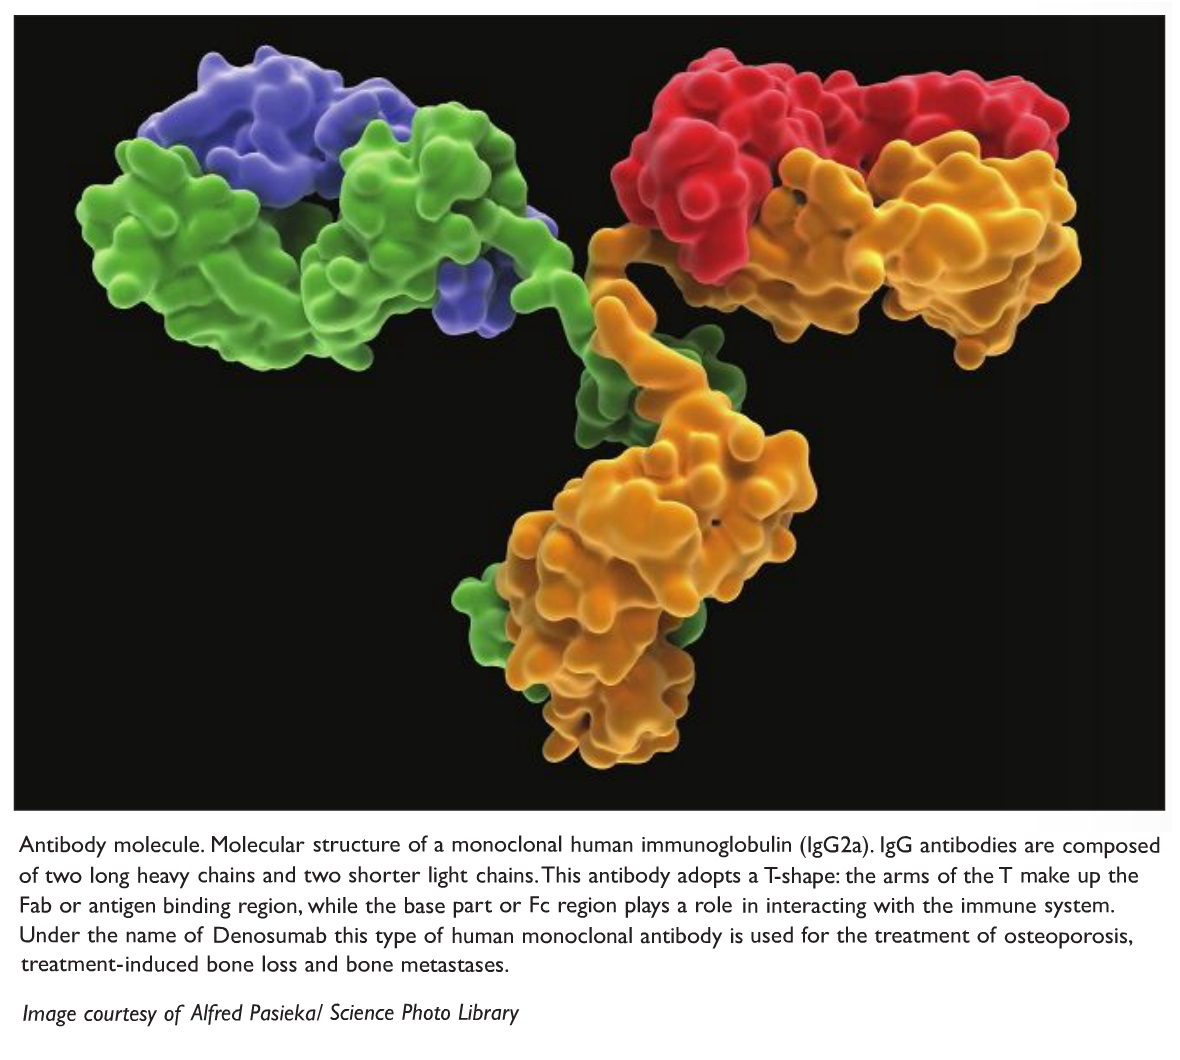 Image 1 Antibody molecule, molecular structure of a monoclonal human immunoglobulin (IgG2a)